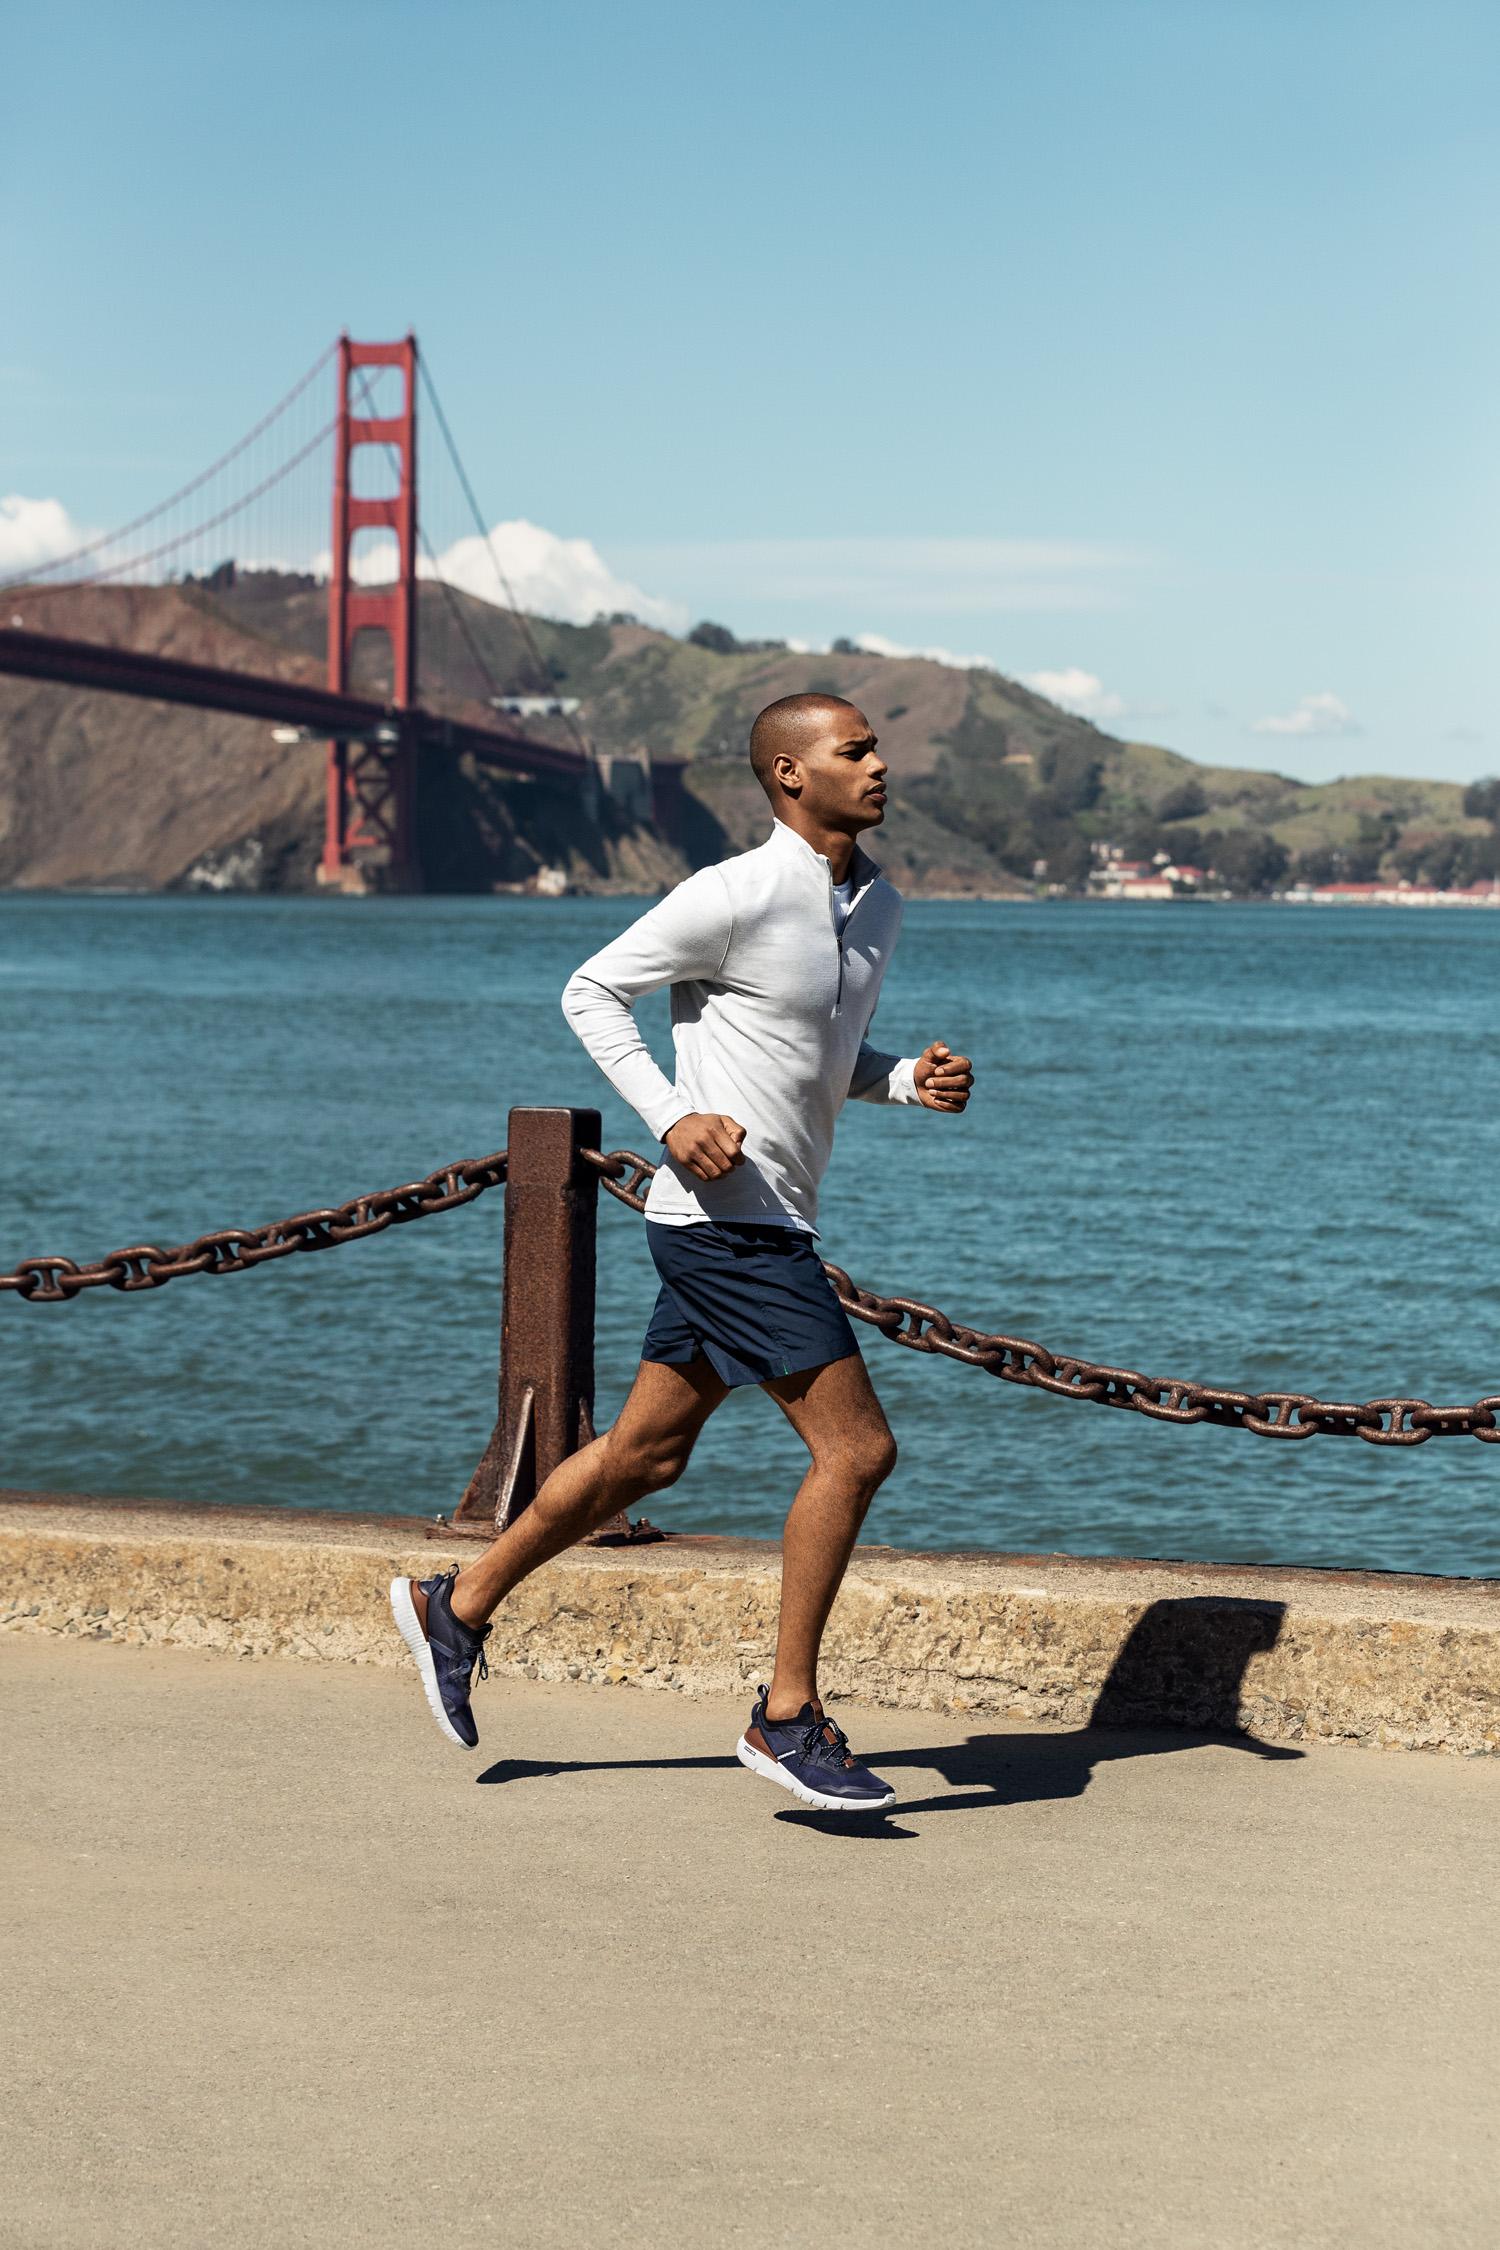 Cole Haan Men's ZERØGRAND Overtake Running Shoe in Marine Blue - Optic White